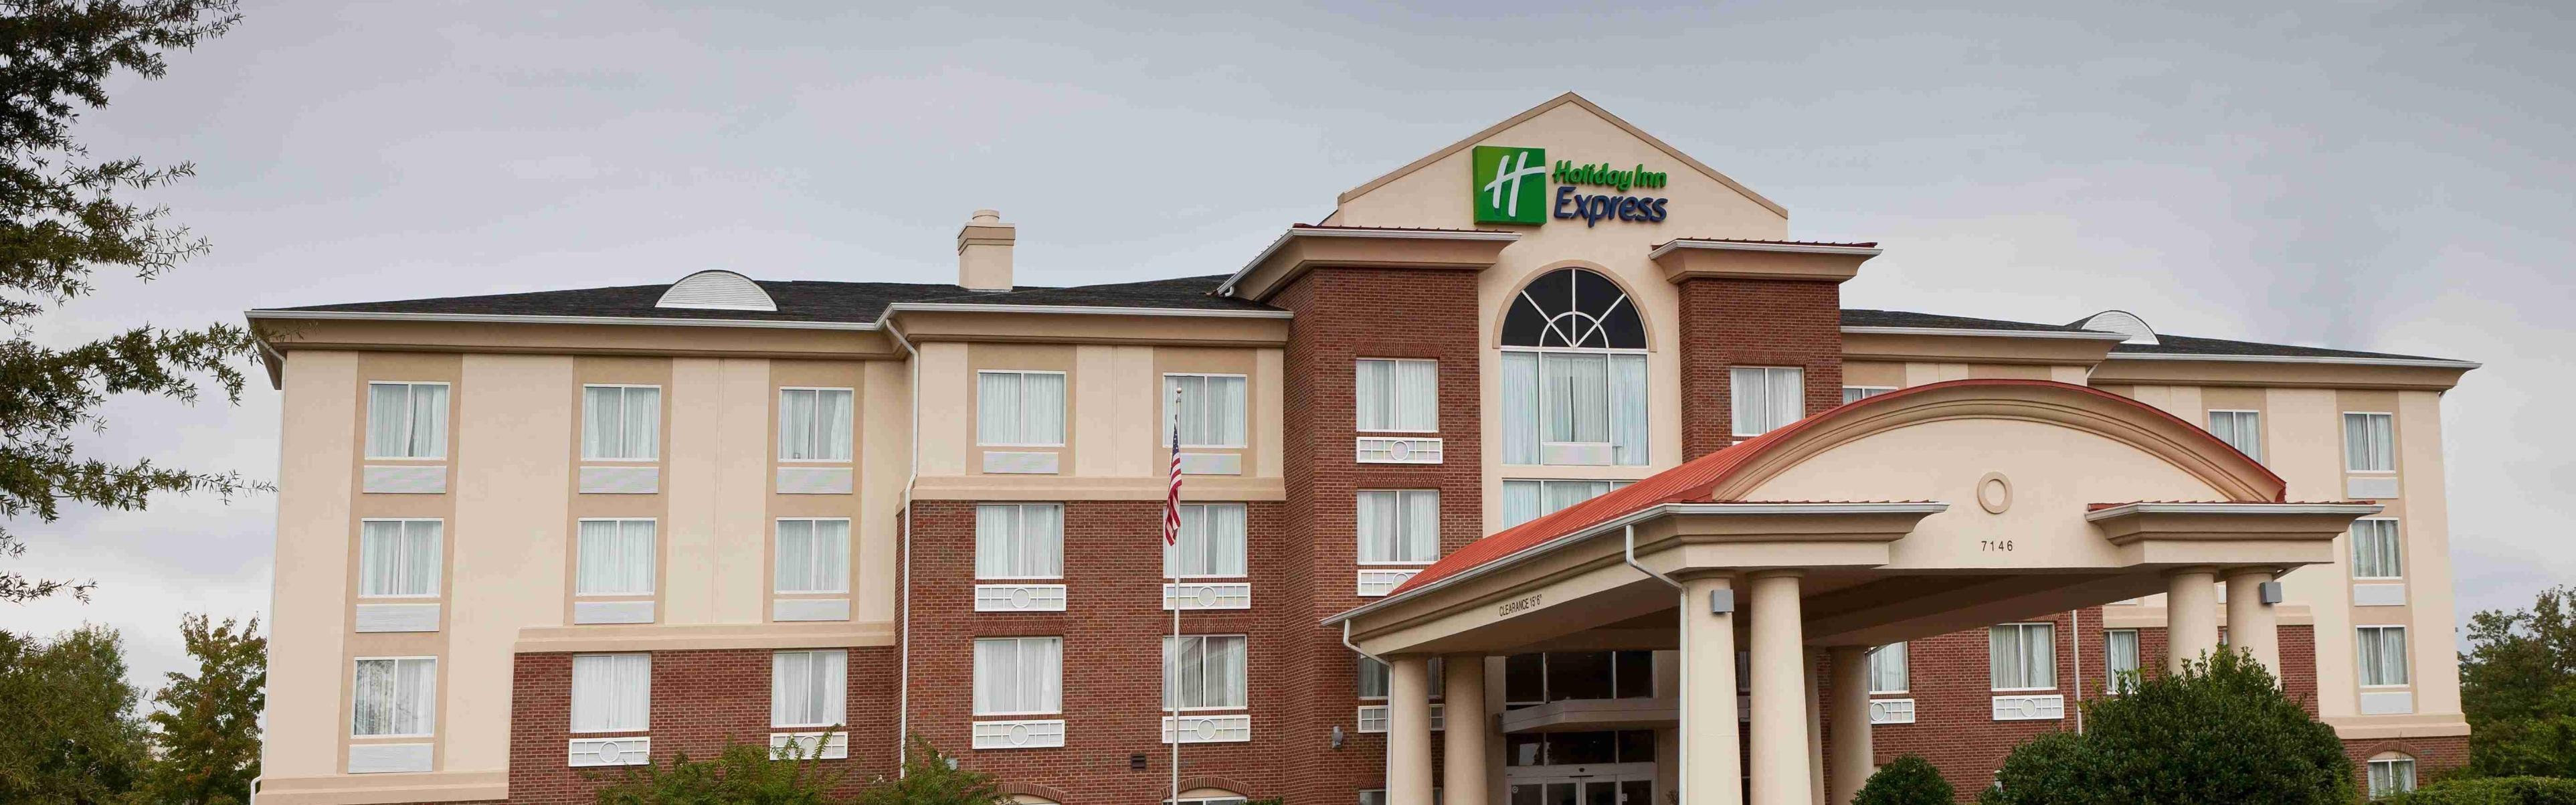 Holiday Inn Express U0026 Suites Atlanta Johns Creek Hotel By IHG